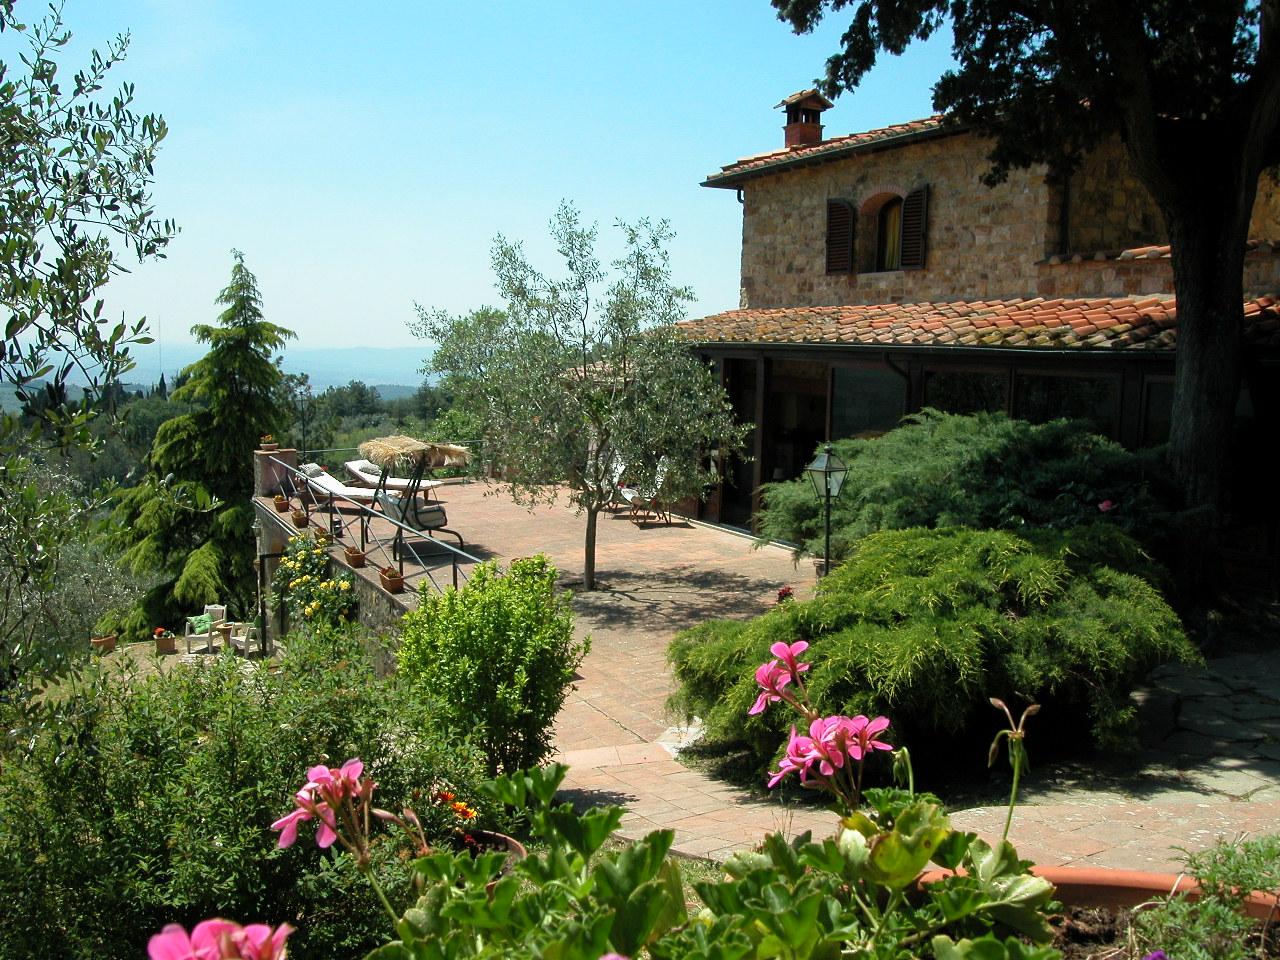 Matrimonio Toscana Location : Agriturismi e ville per matrimoni in toscana